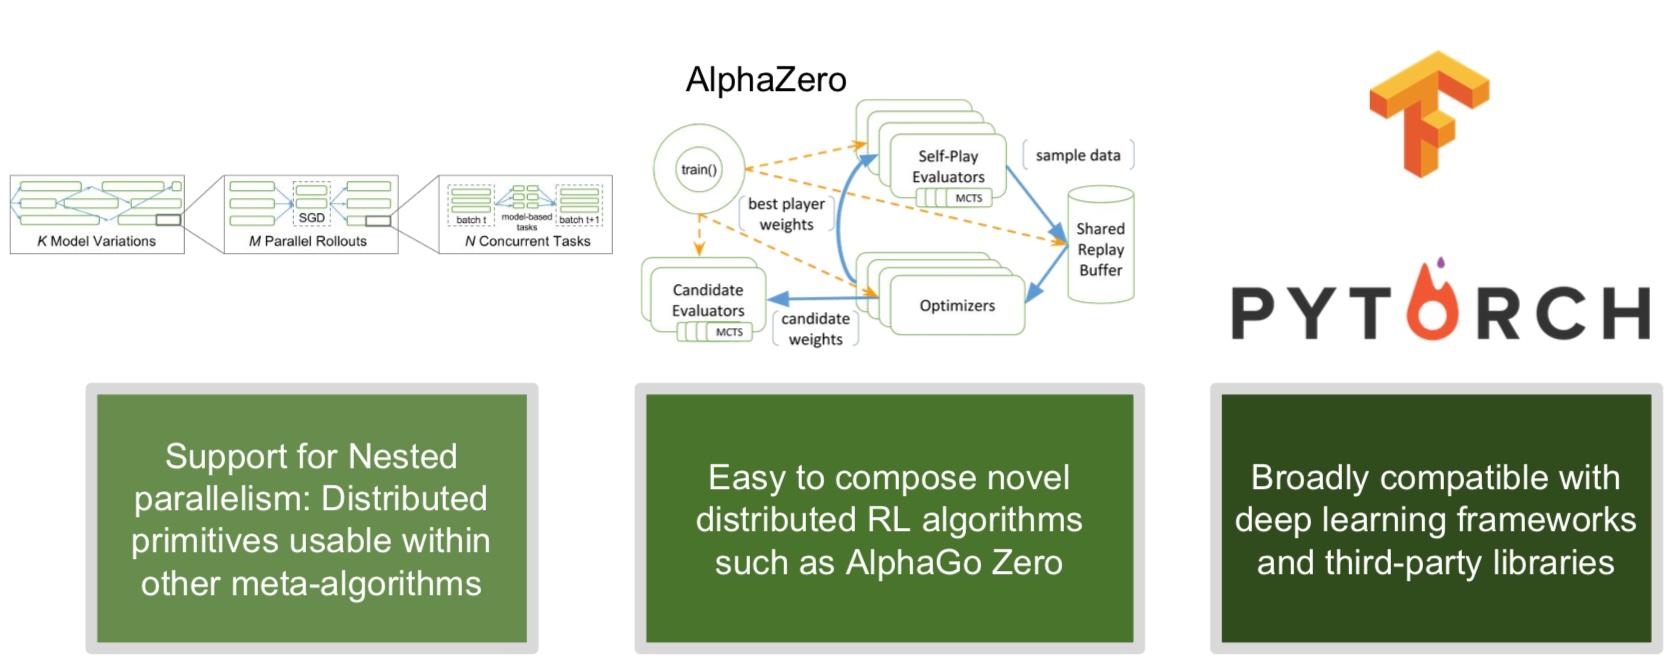 RLlib offers composability